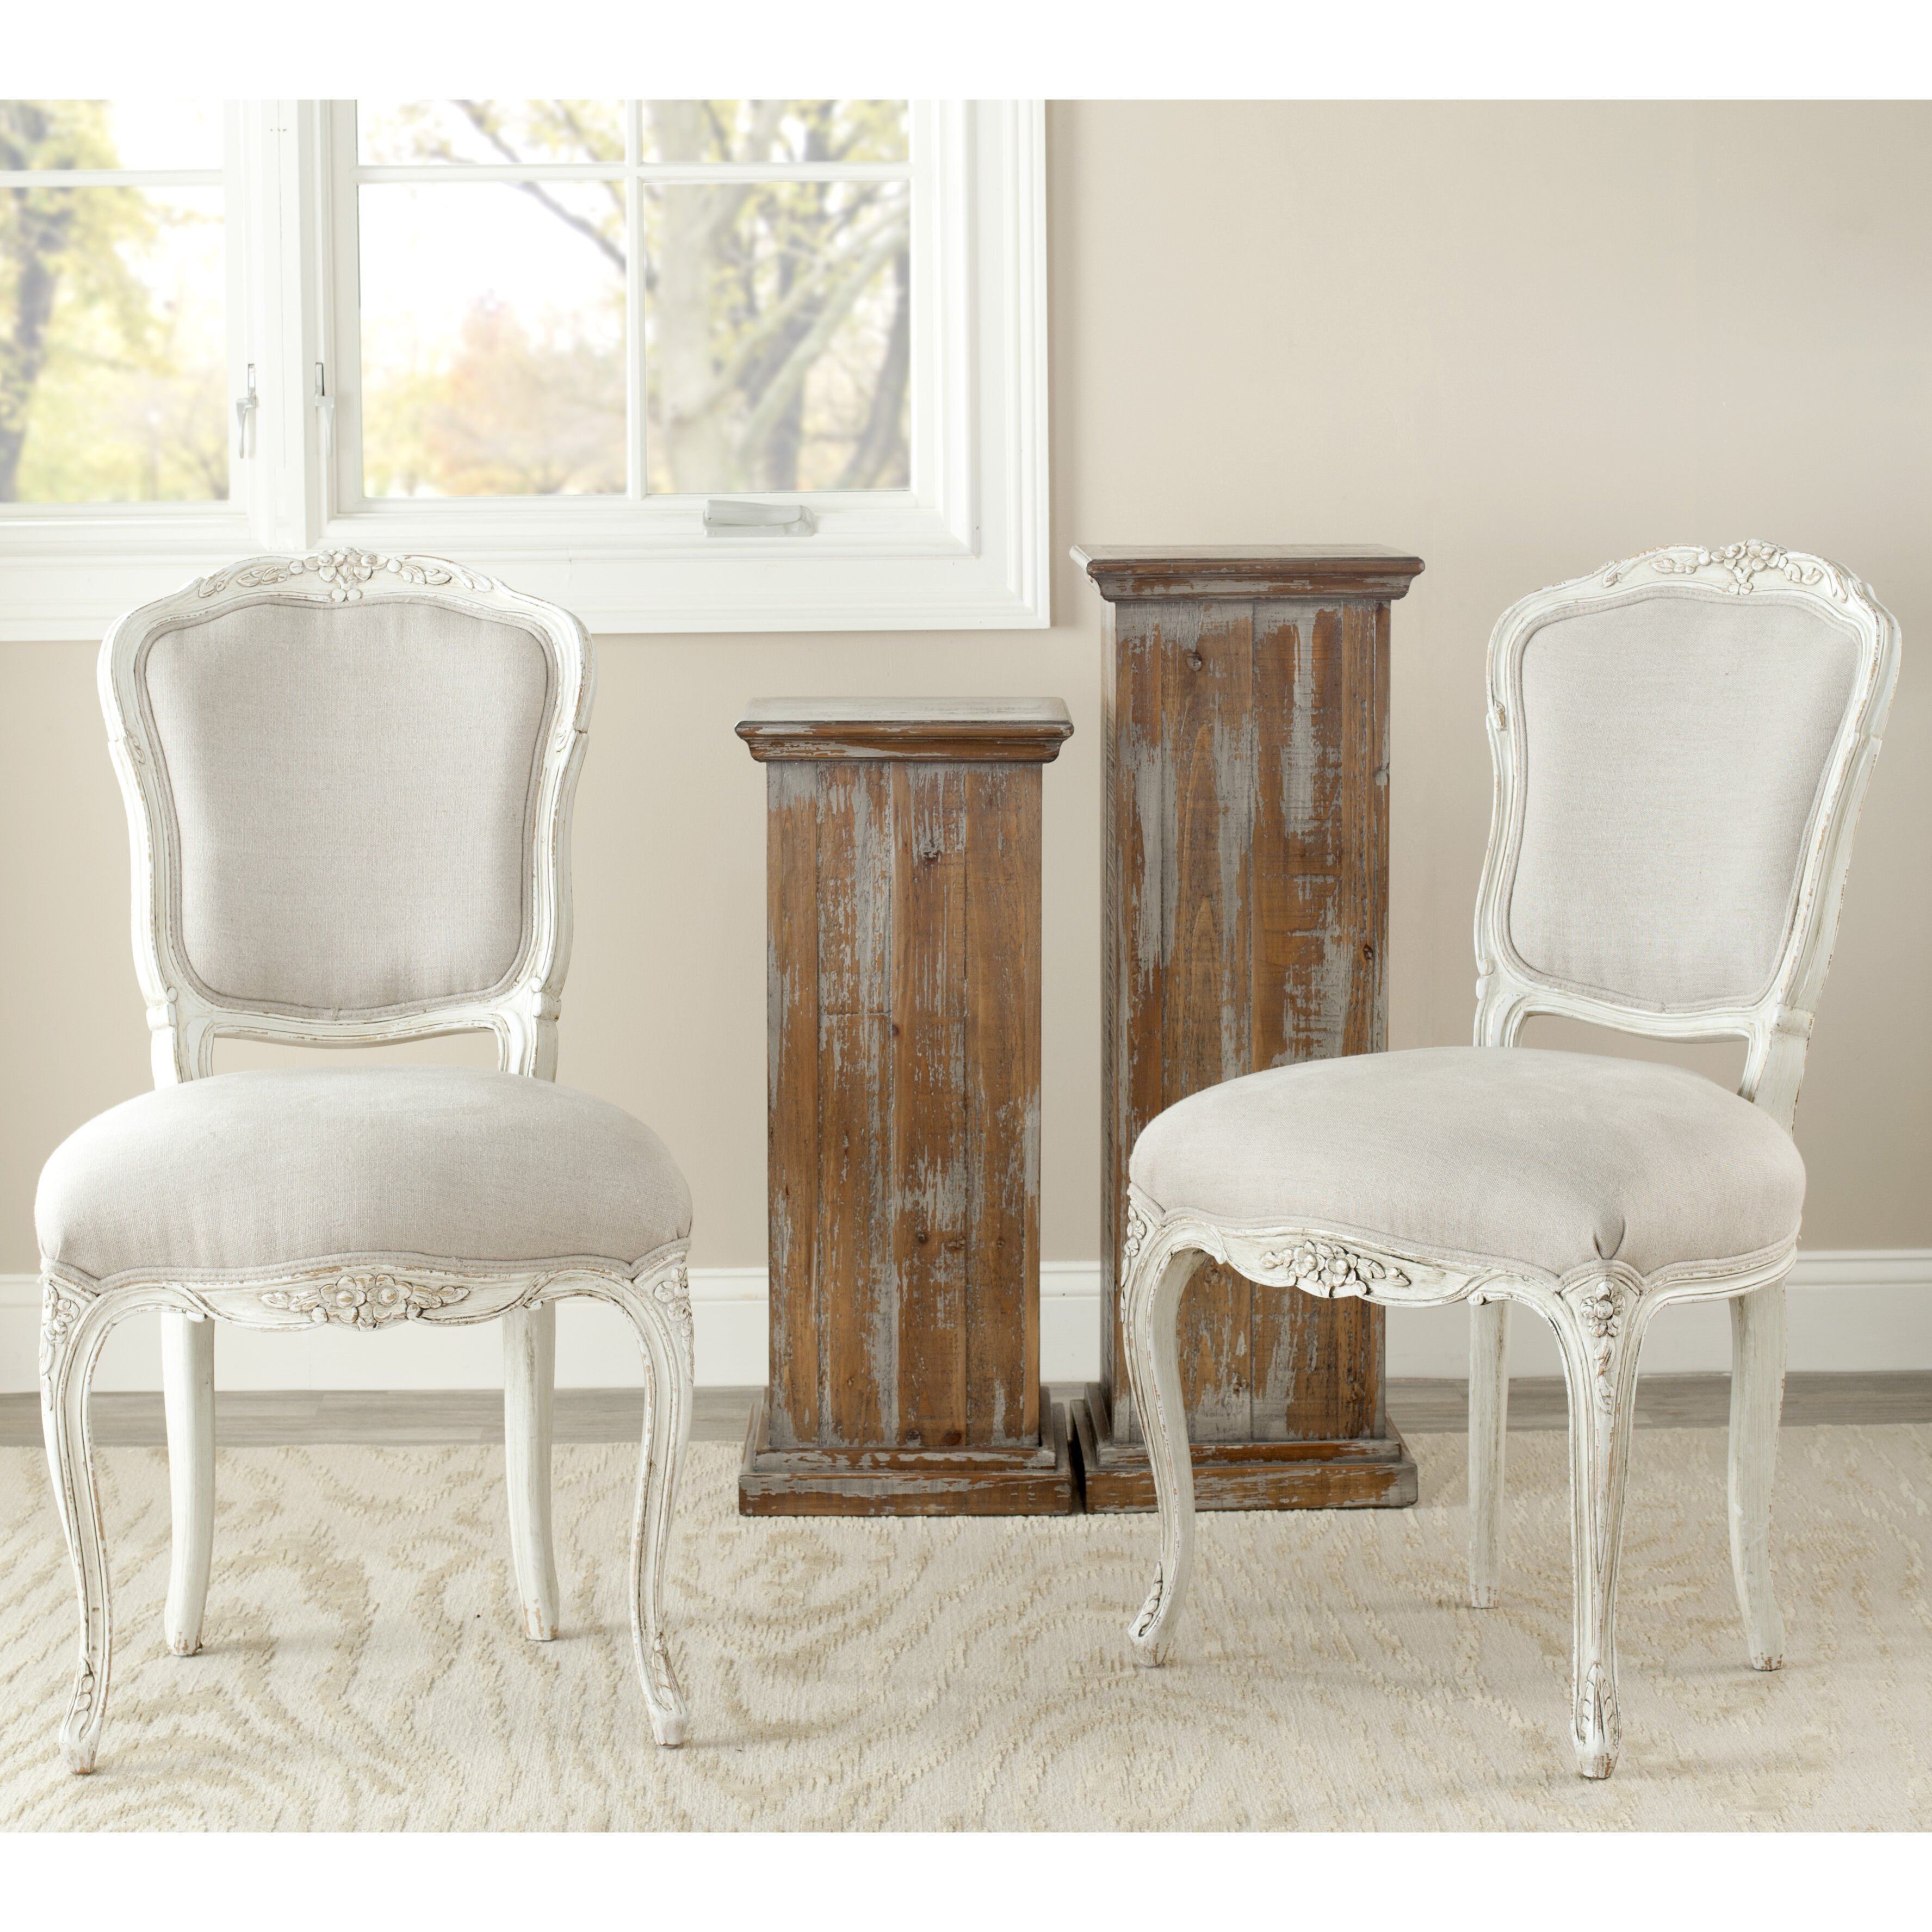 safavieh yaretzi side chair reviews wayfair. Black Bedroom Furniture Sets. Home Design Ideas